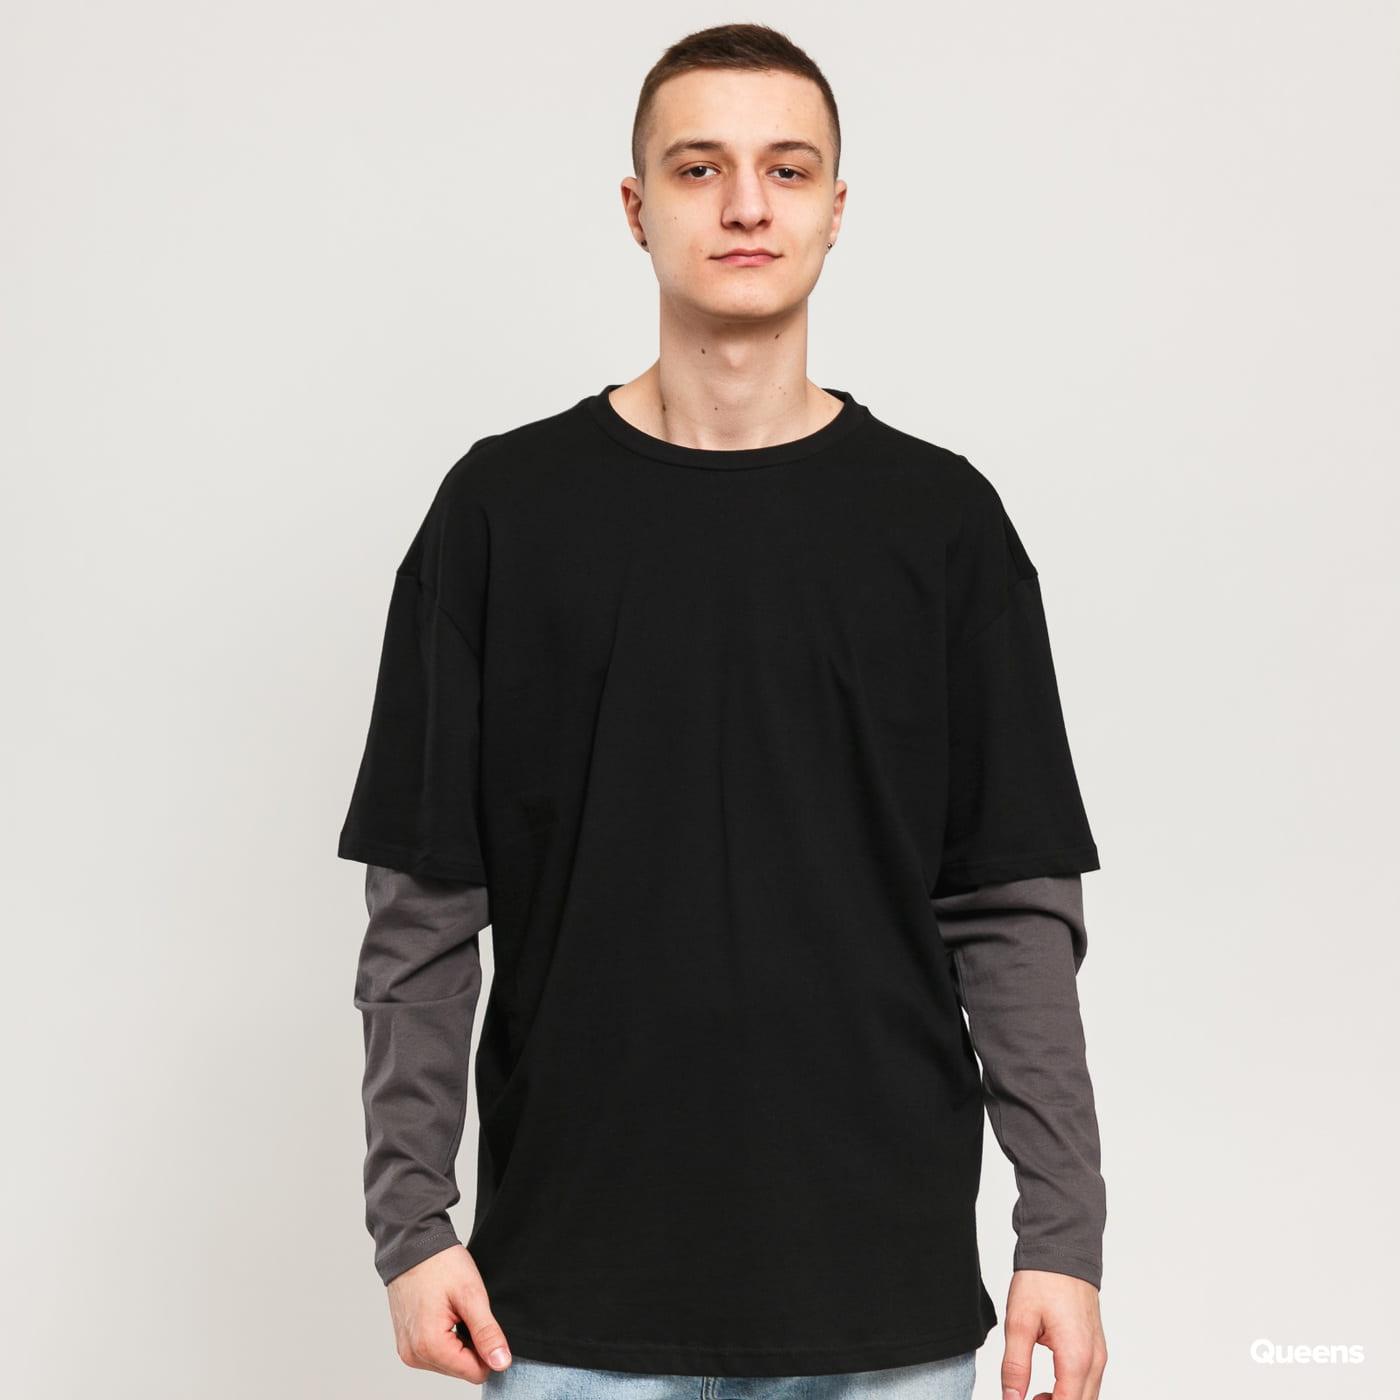 Urban Classics Oversized Shaped Double Layer LS Tee black / dark gray